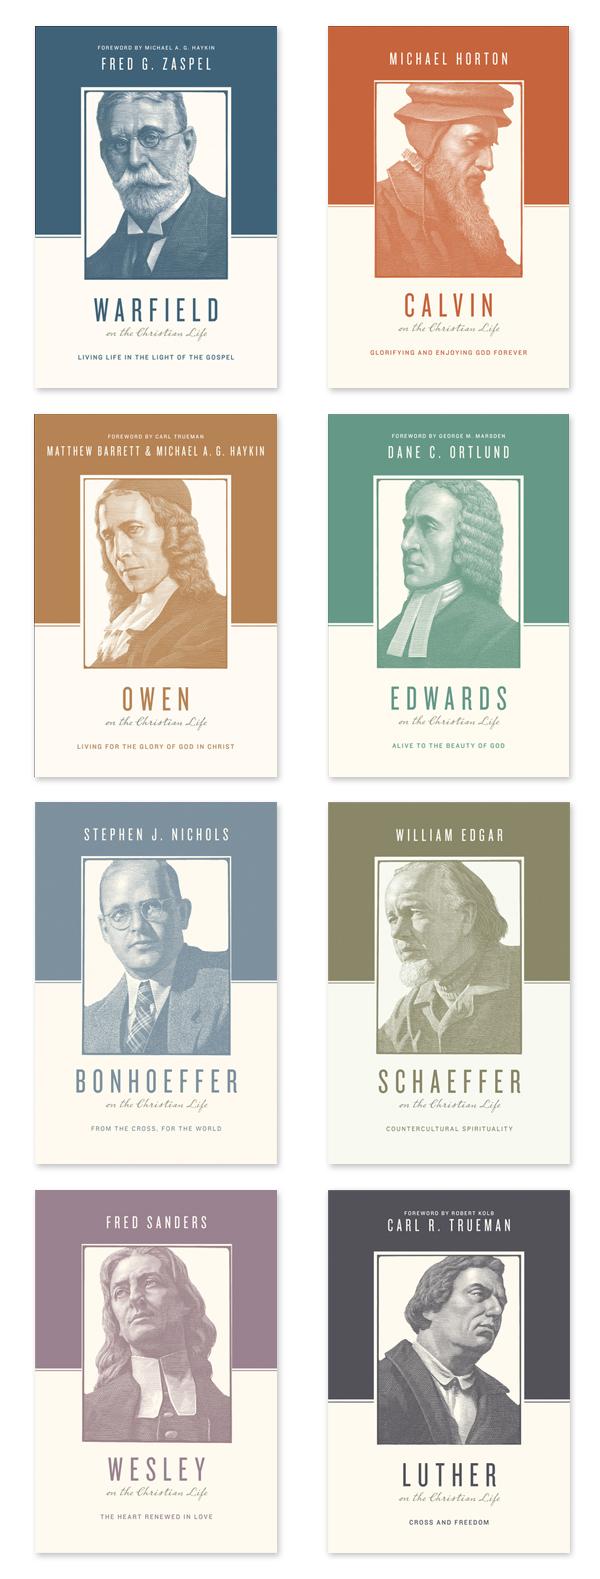 theologians.jpg